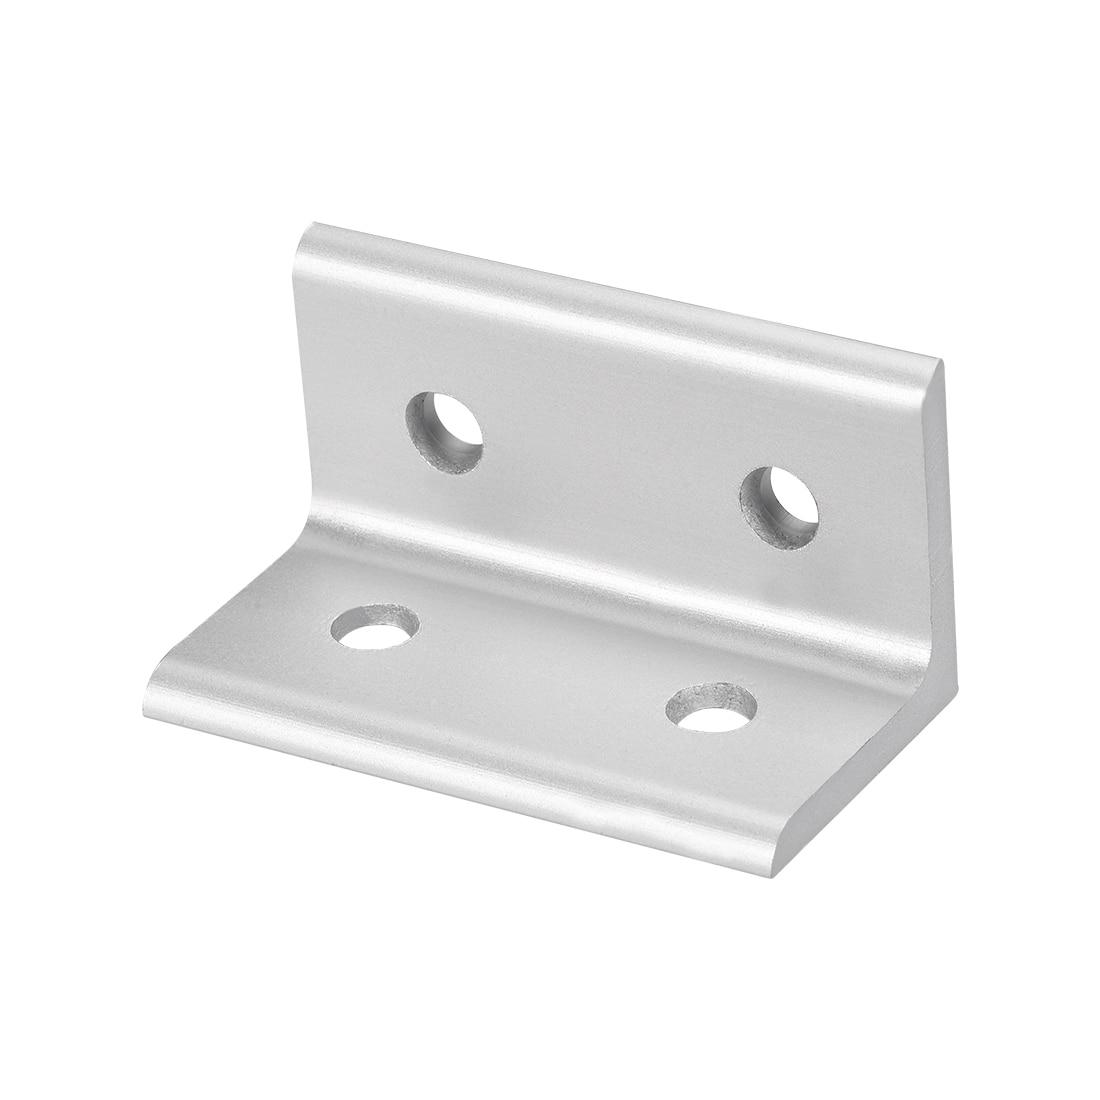 Soporte de esquina uxcell 3060 para perfil de extrusión de aluminio serie 3030 con ranura de 8mm, 4 Uds